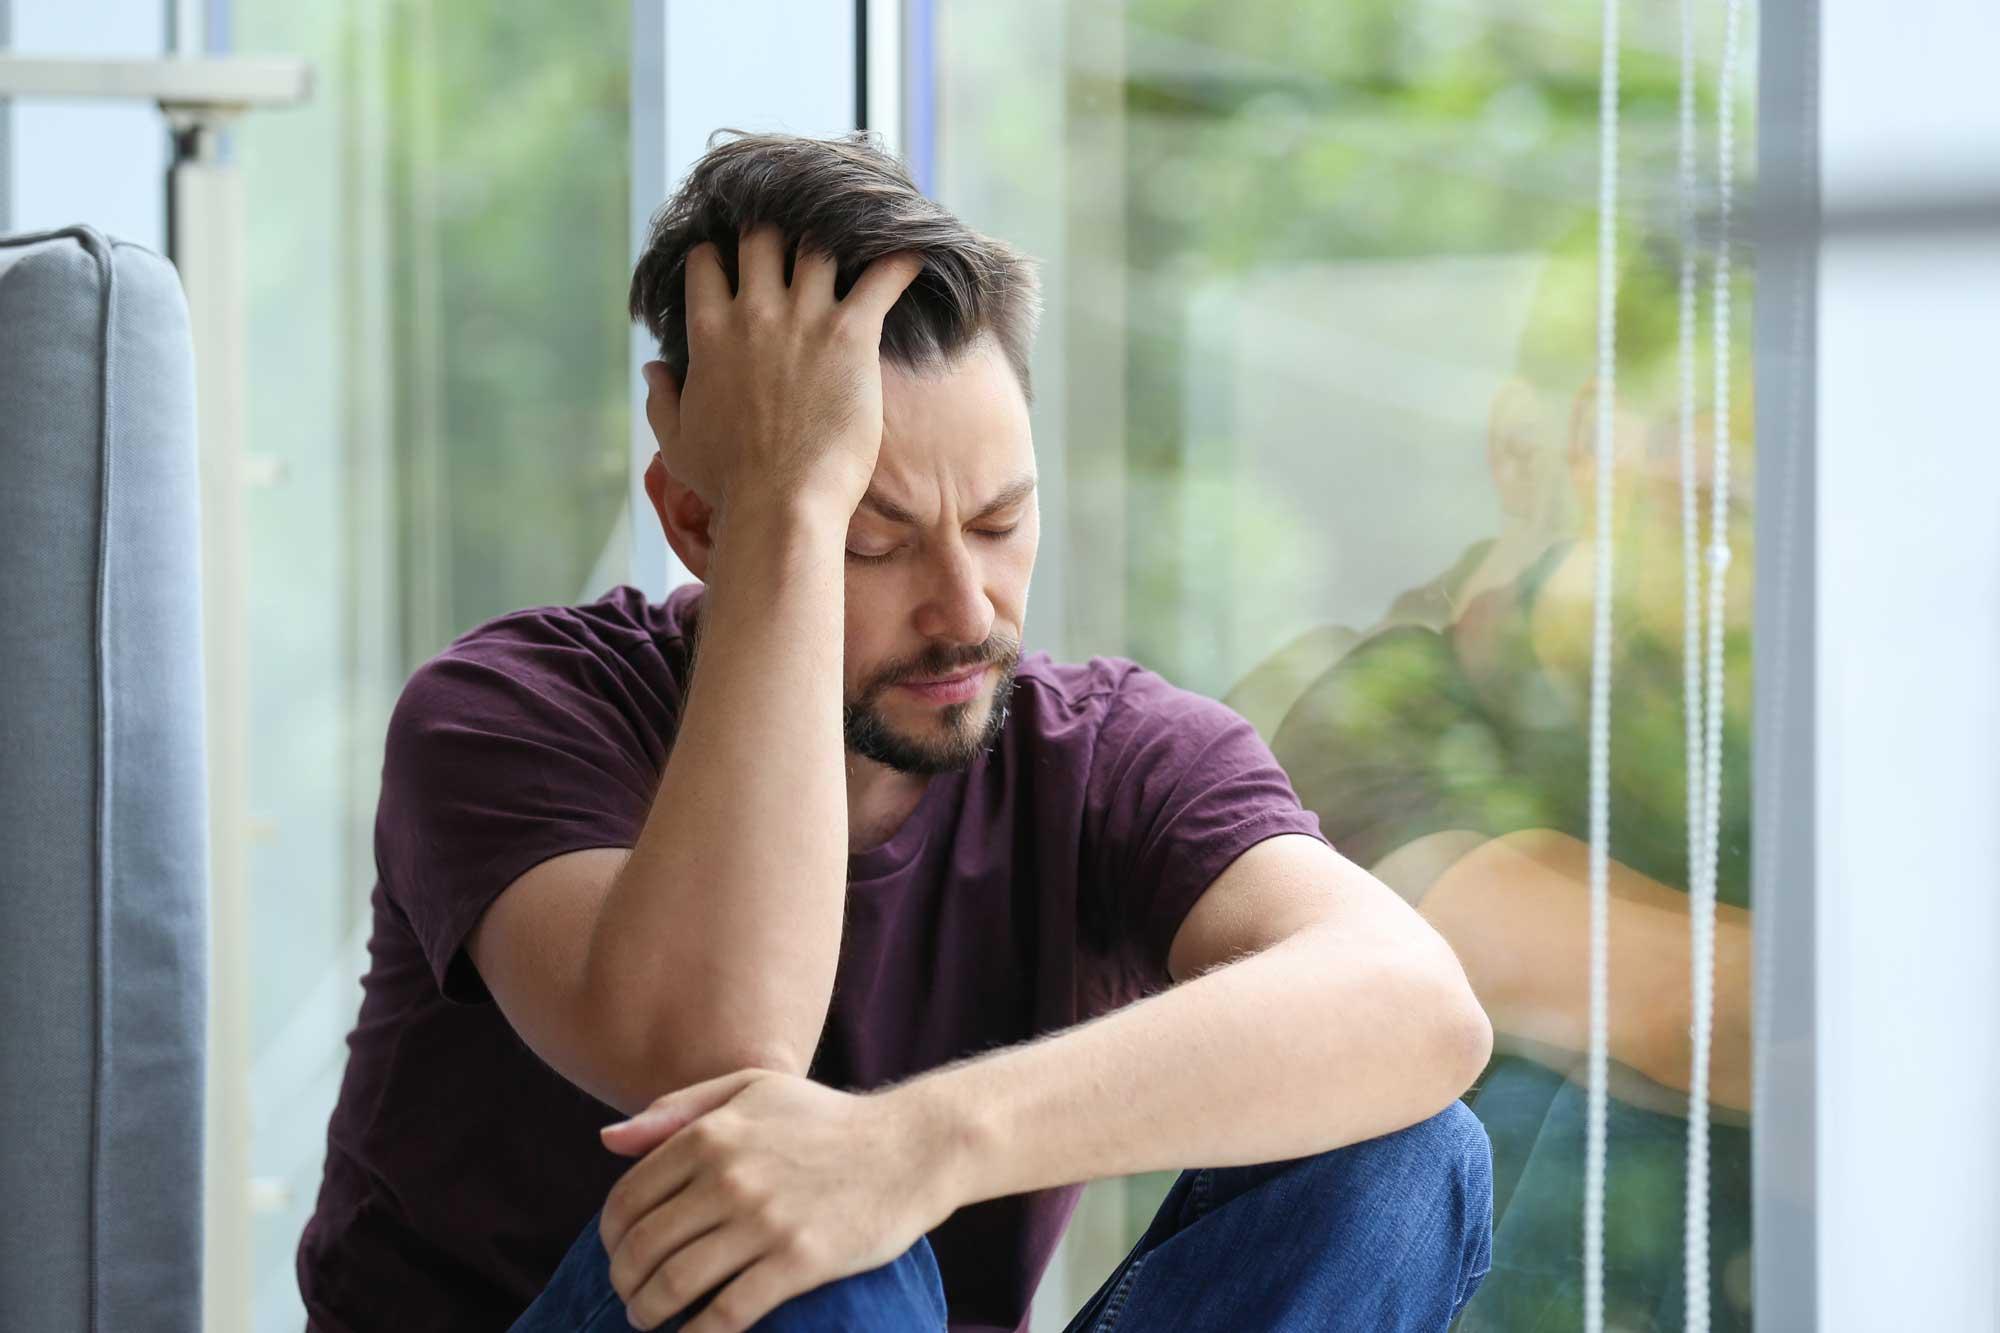 grief depressed man